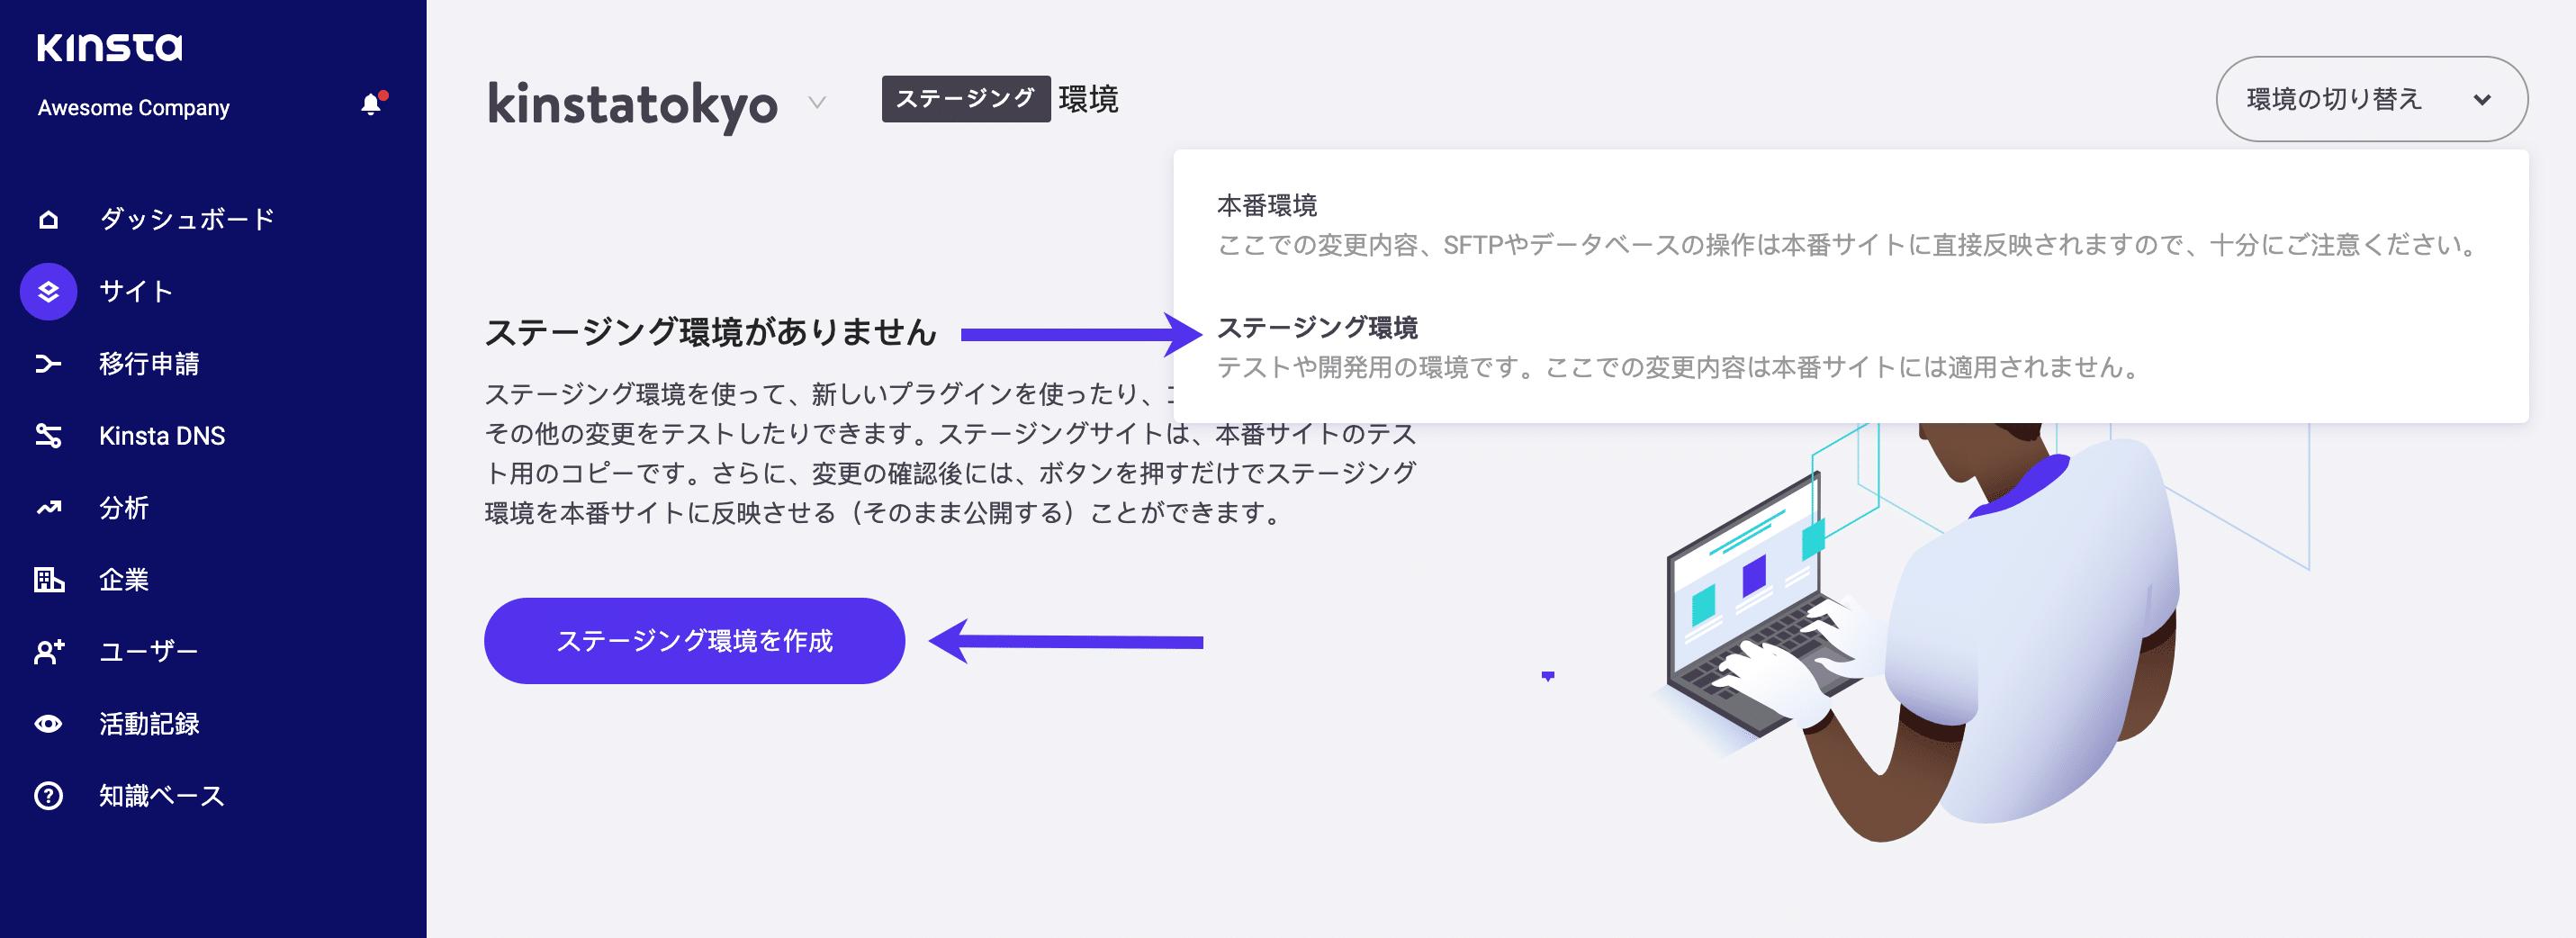 MyKinstaでWordPressステージング環境を作成する